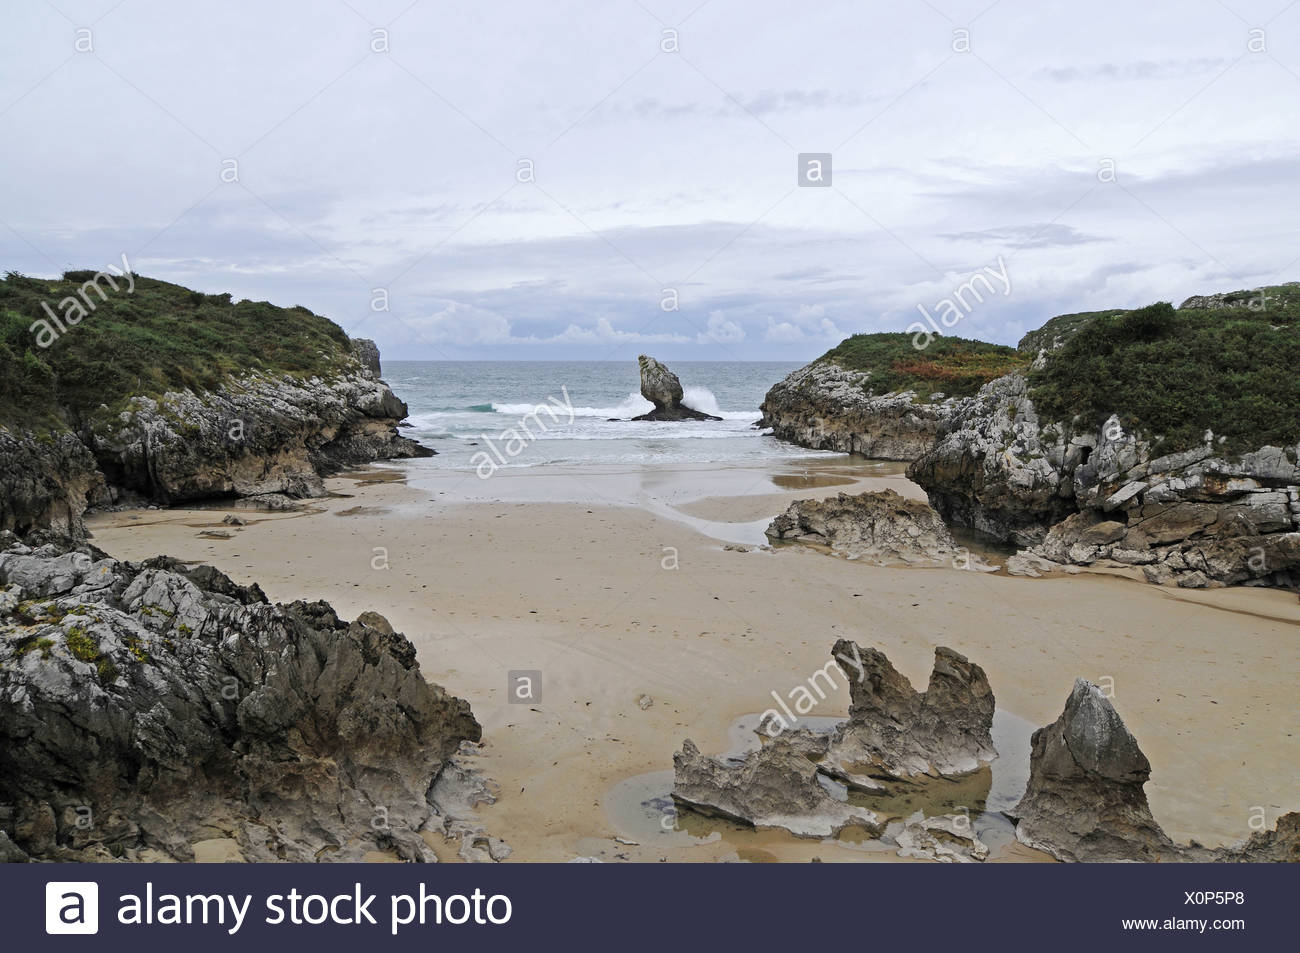 Playa de Buelna - Stock Image